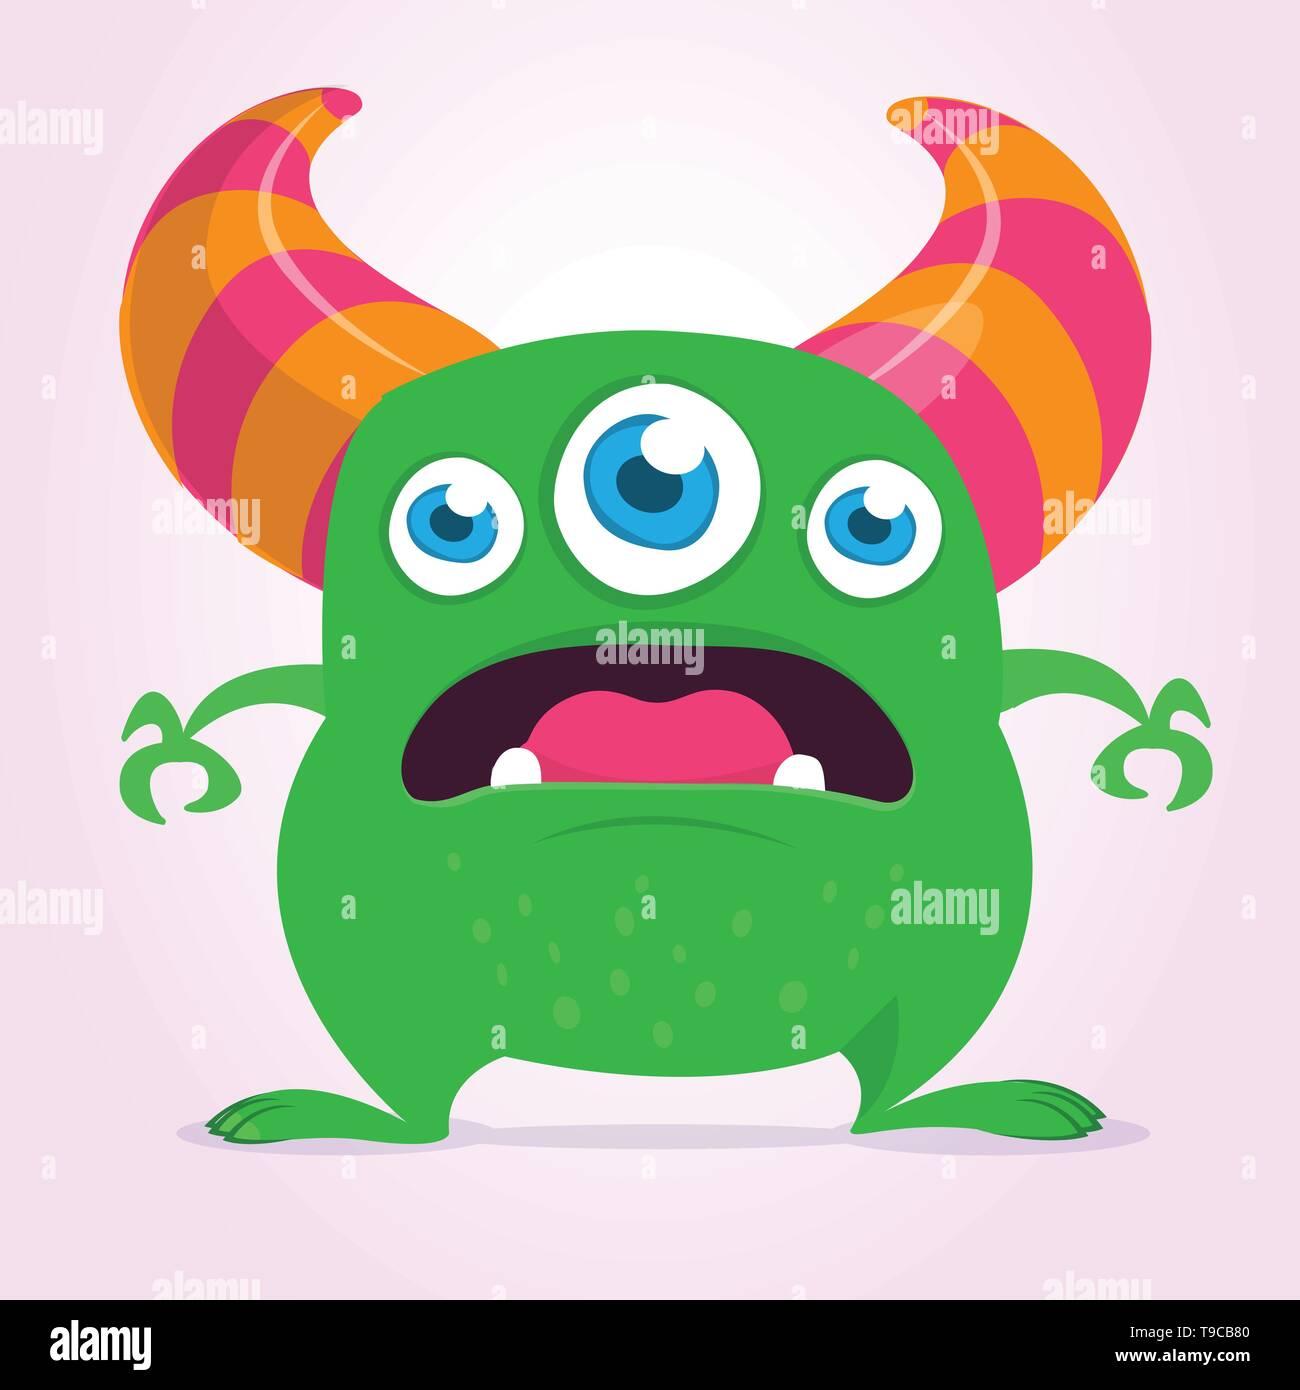 Cool cartoon monster with three eyes. Vector green monster illustration. Halloween design - Stock Image